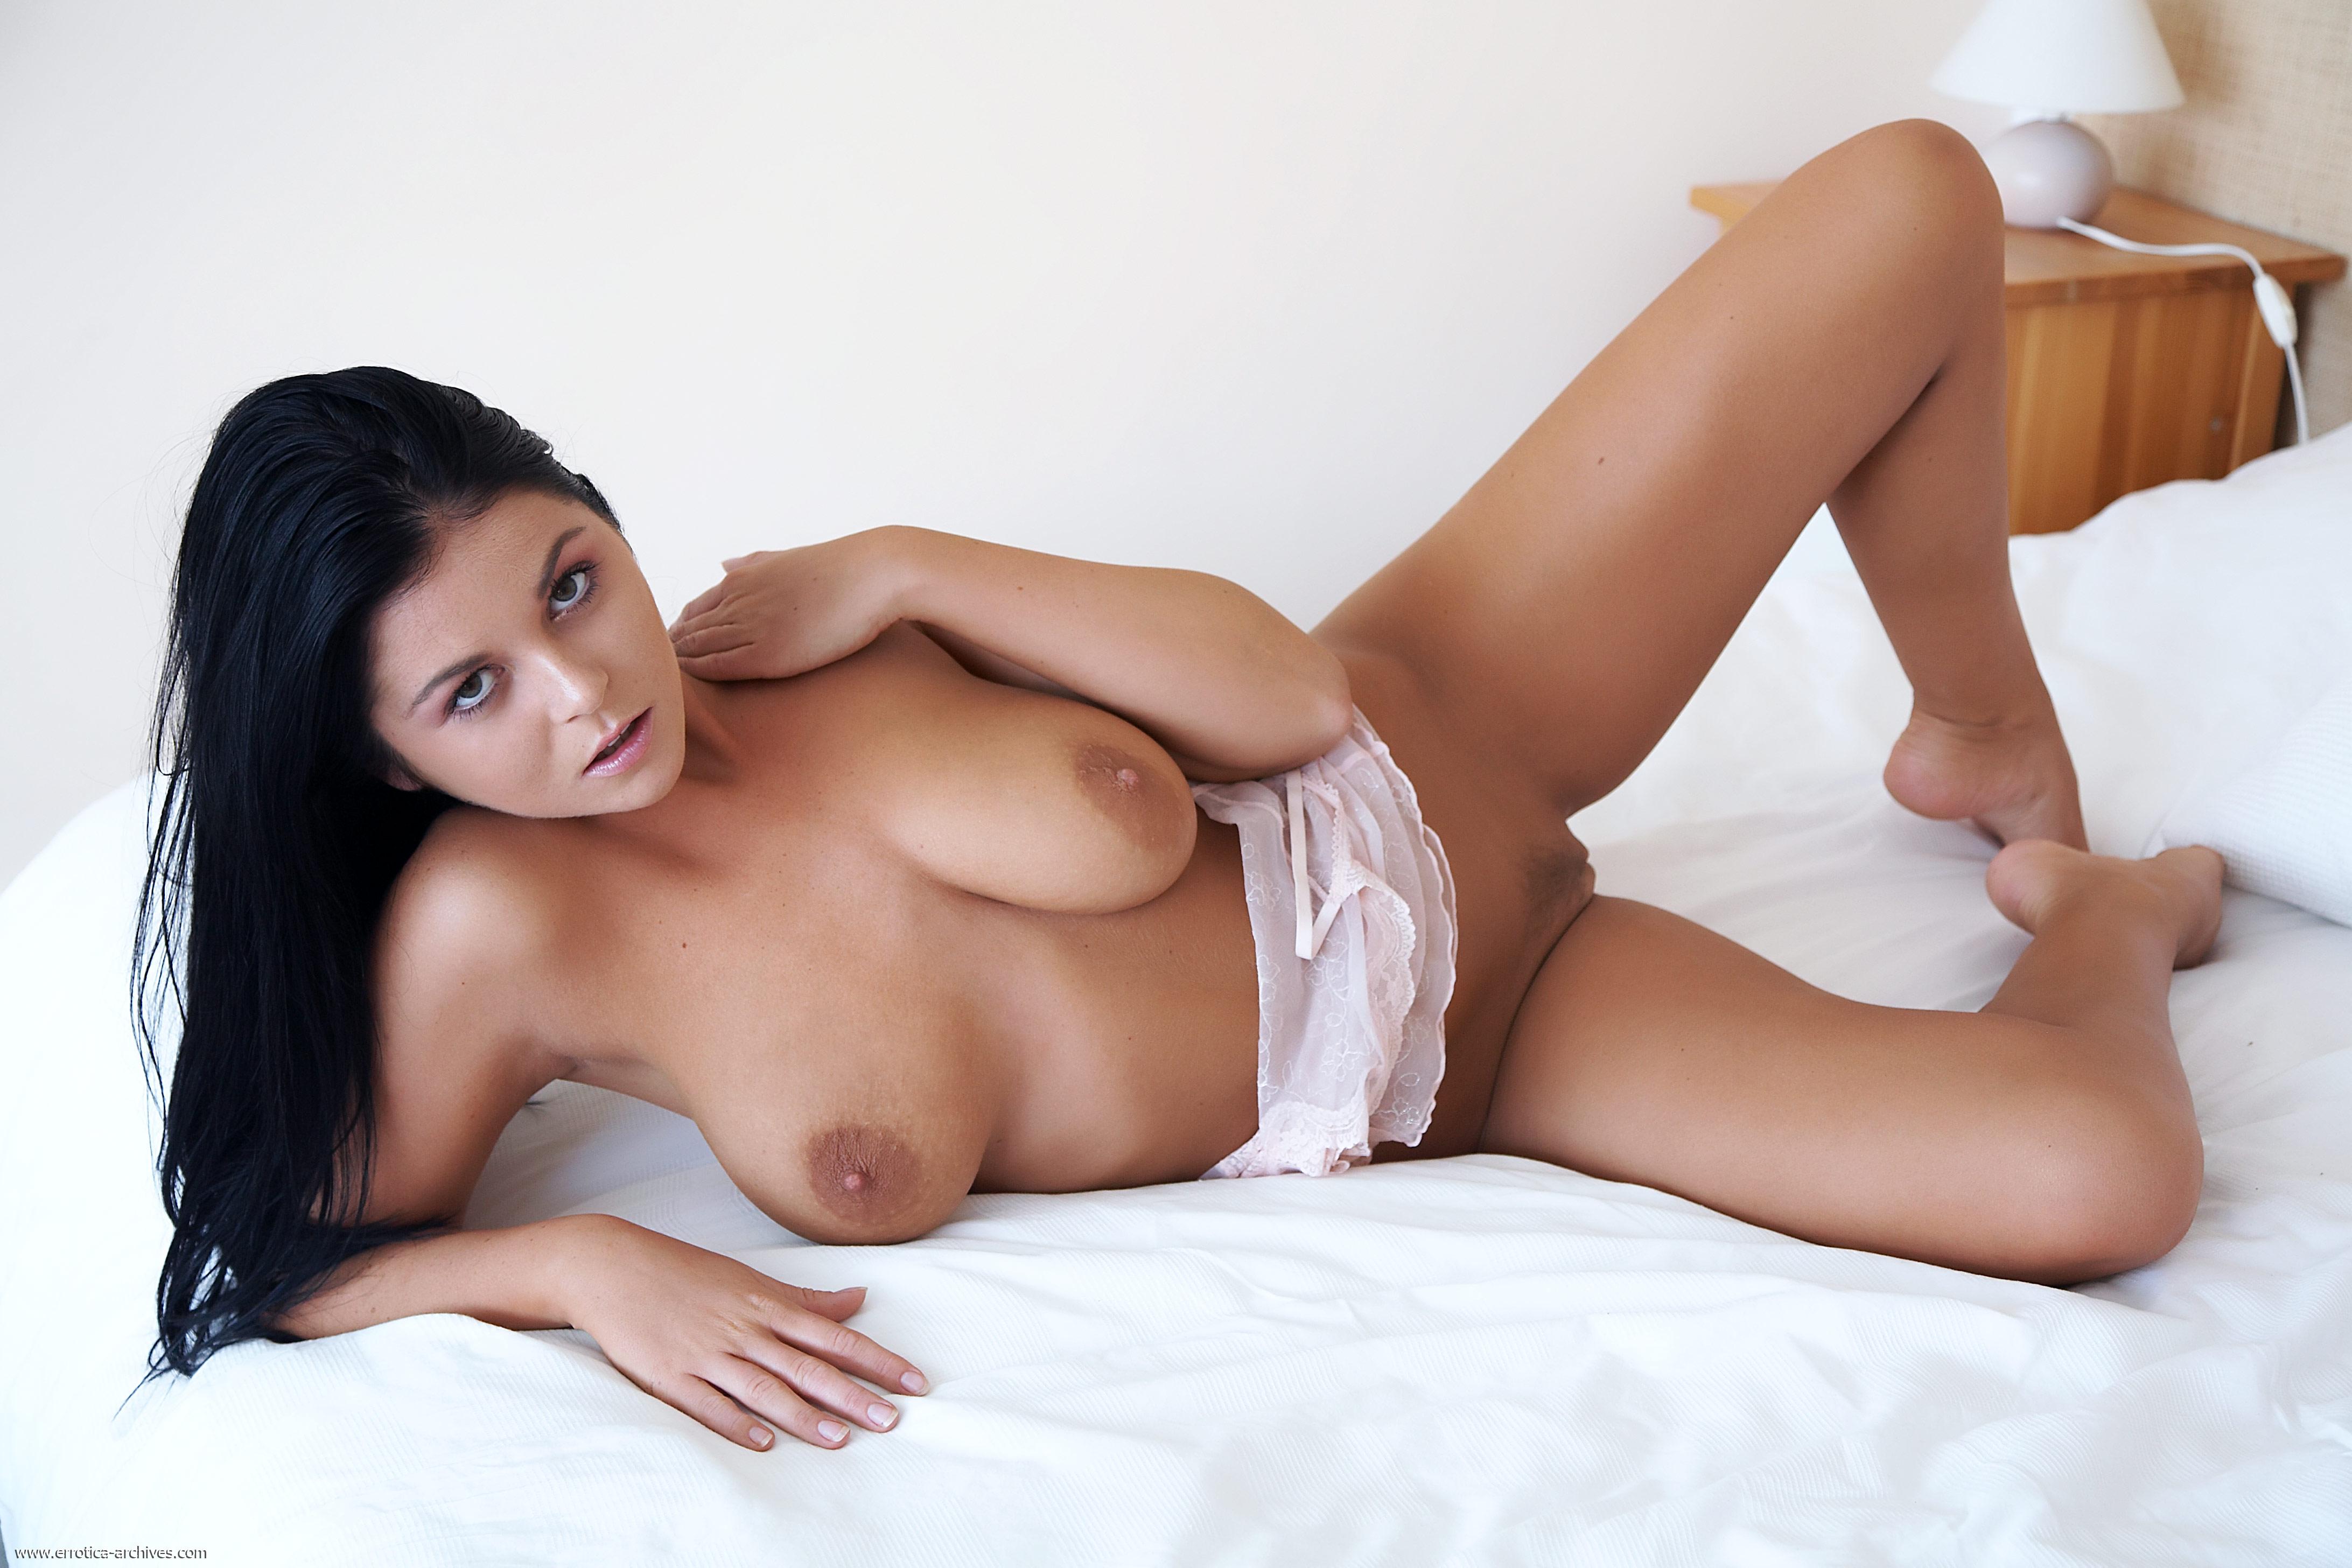 large dark nipples